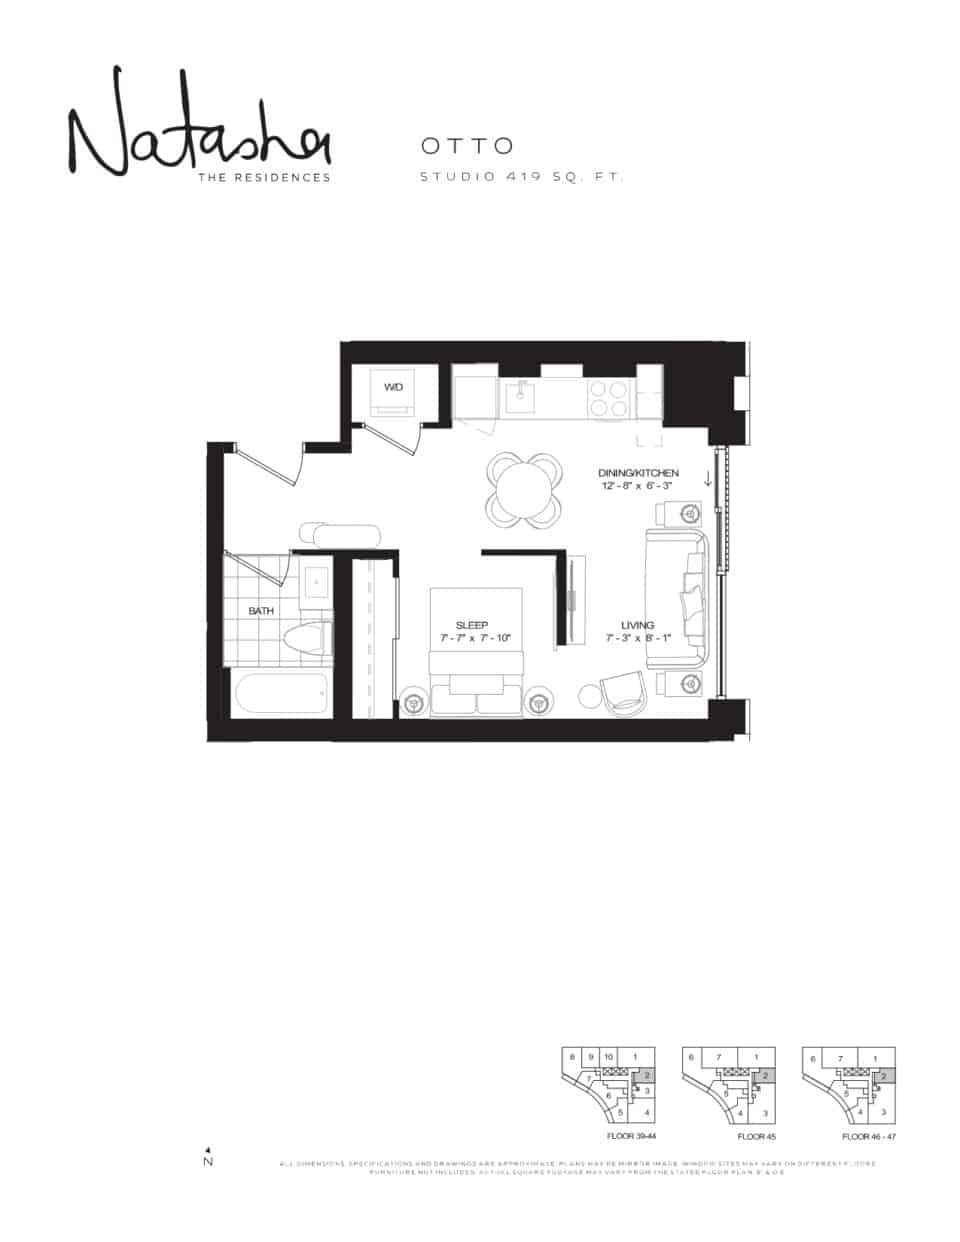 2021 09 02 11 02 51 natashatheresidences lanterradevelopments floorplans otto